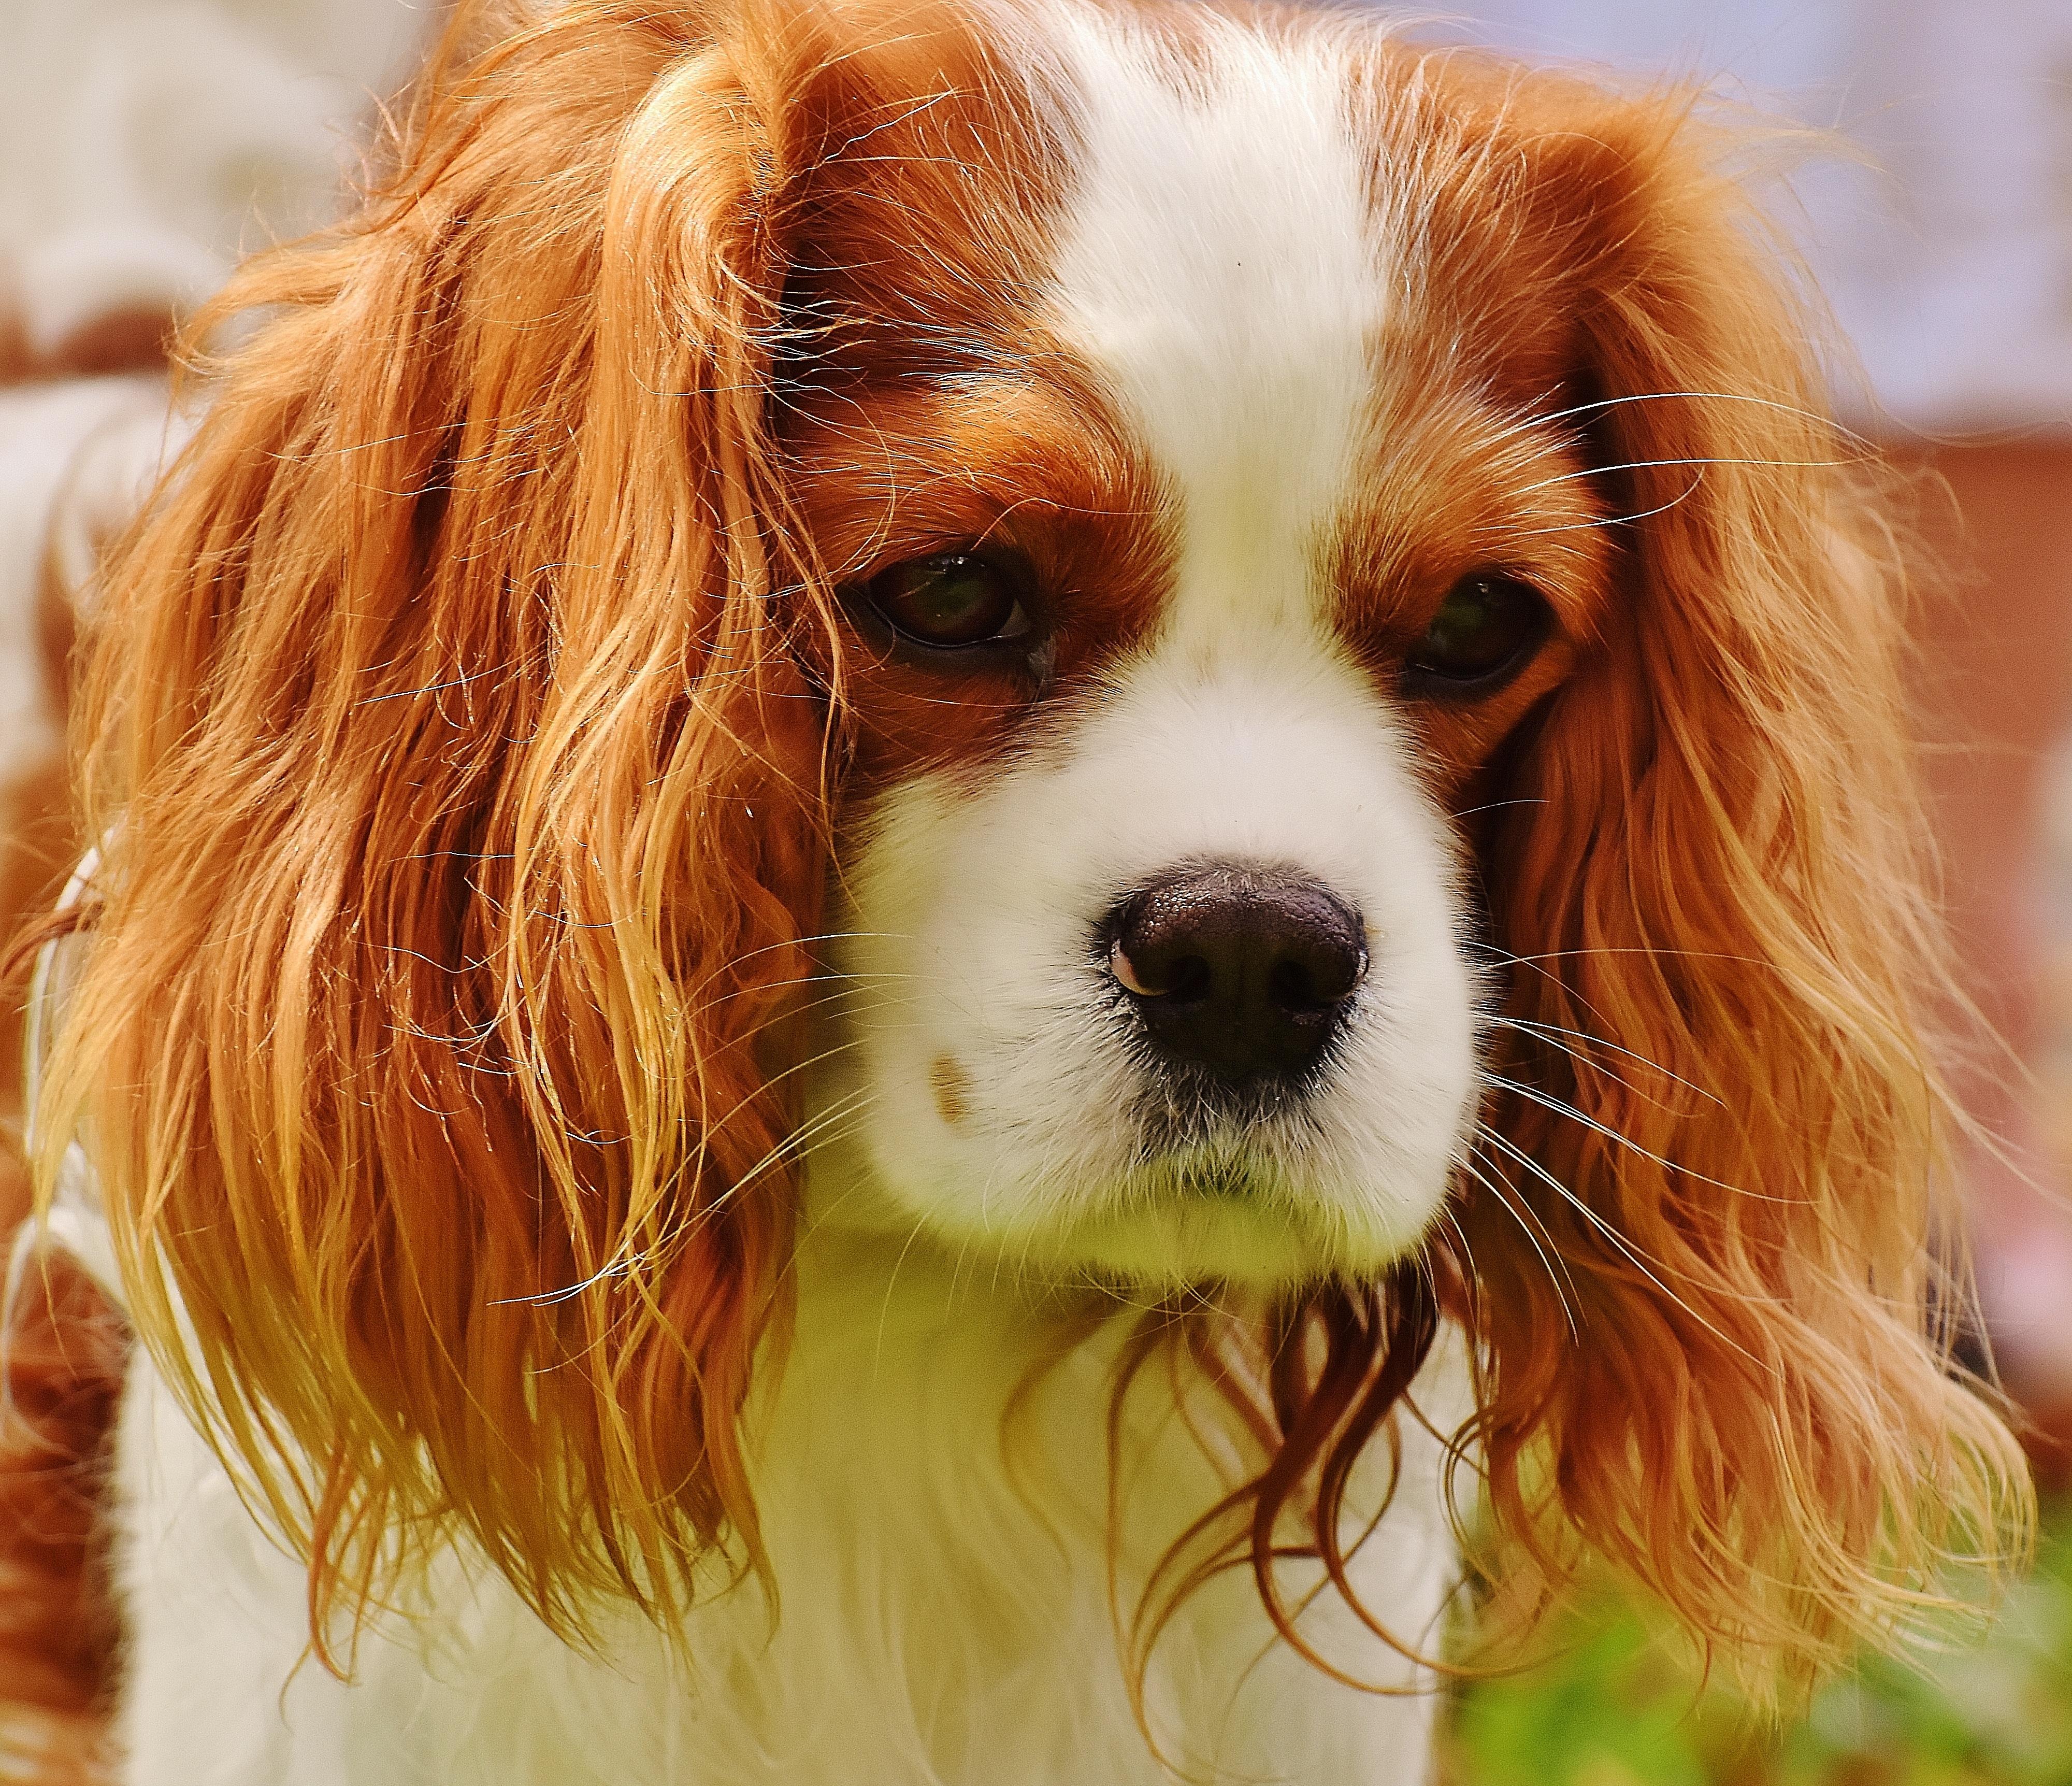 Most Inspiring Charles Spaniel Brown Adorable Dog - white-dog-animal-cute-pet-fur-brown-mammal-spaniel-vertebrate-funny-dog-breed-cavalier-king-charles-spaniel-king-charles-spaniel-dog-like-mammal-kooikerhondje-welsh-springer-spaniel-phalene-539748  Collection_11438  .jpg